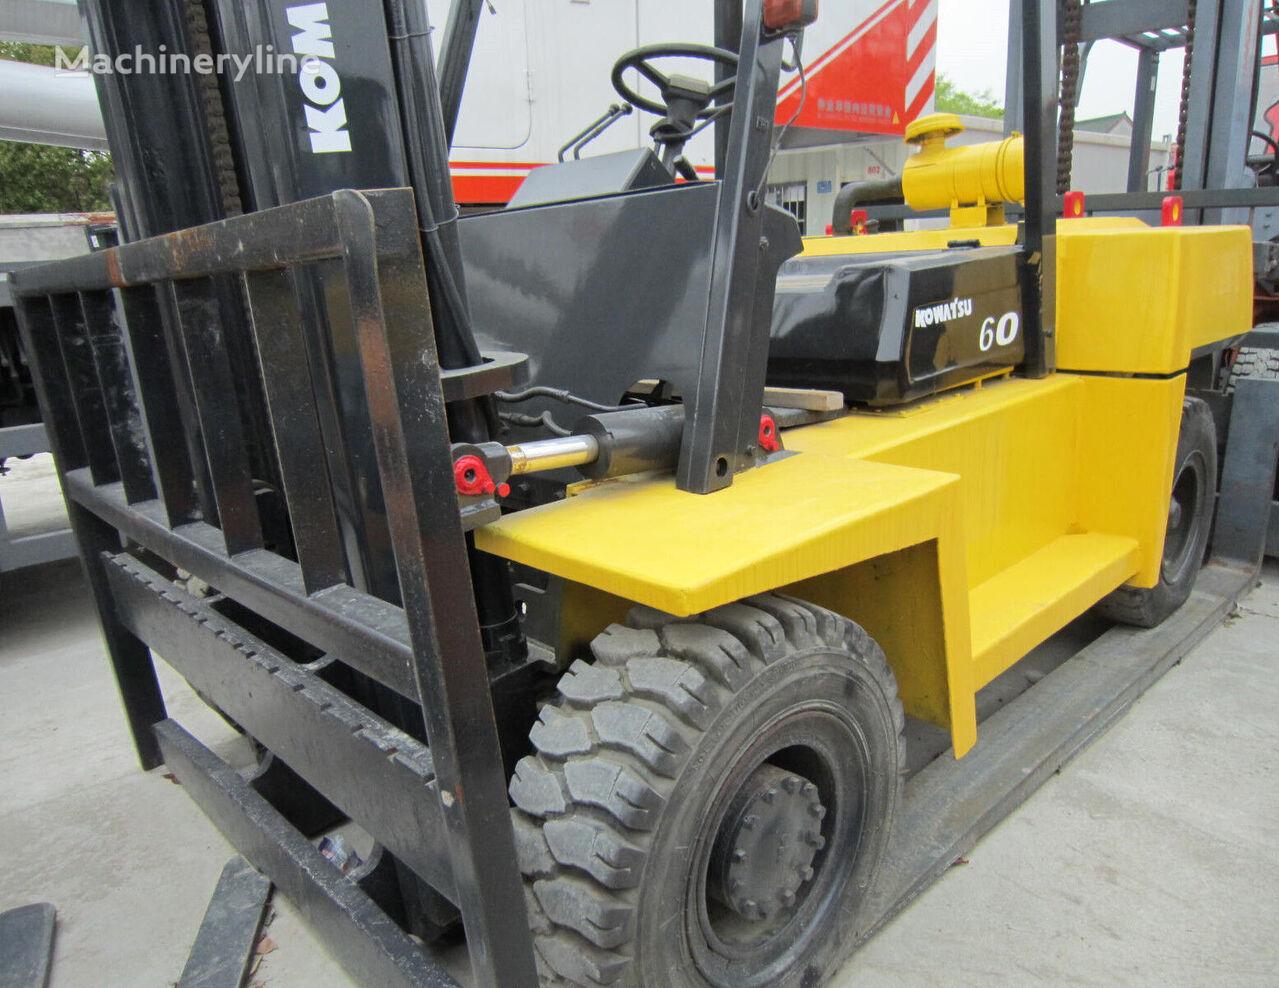 těžký vysokozdvižný vozík KOMATSU FD60